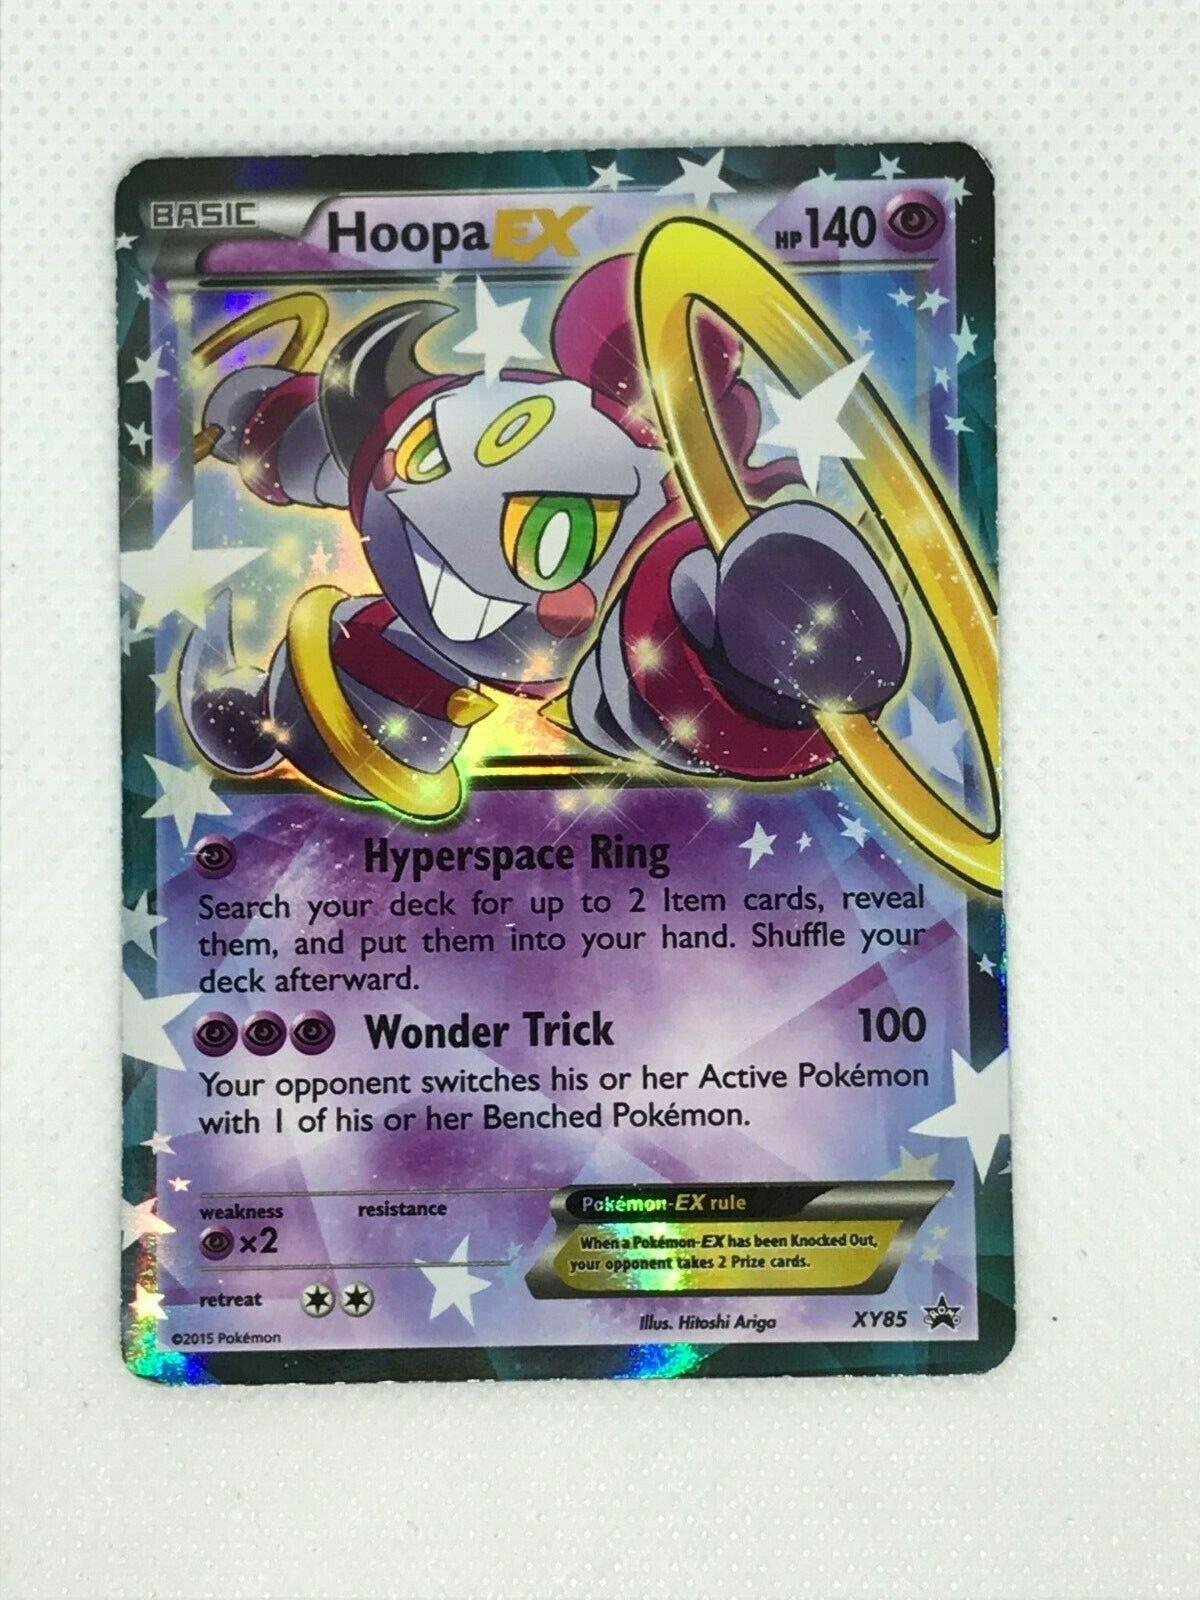 Hoopa-EX XY85 NM-Mint!!! - XY Ultra Rare Promo - x1 Promos